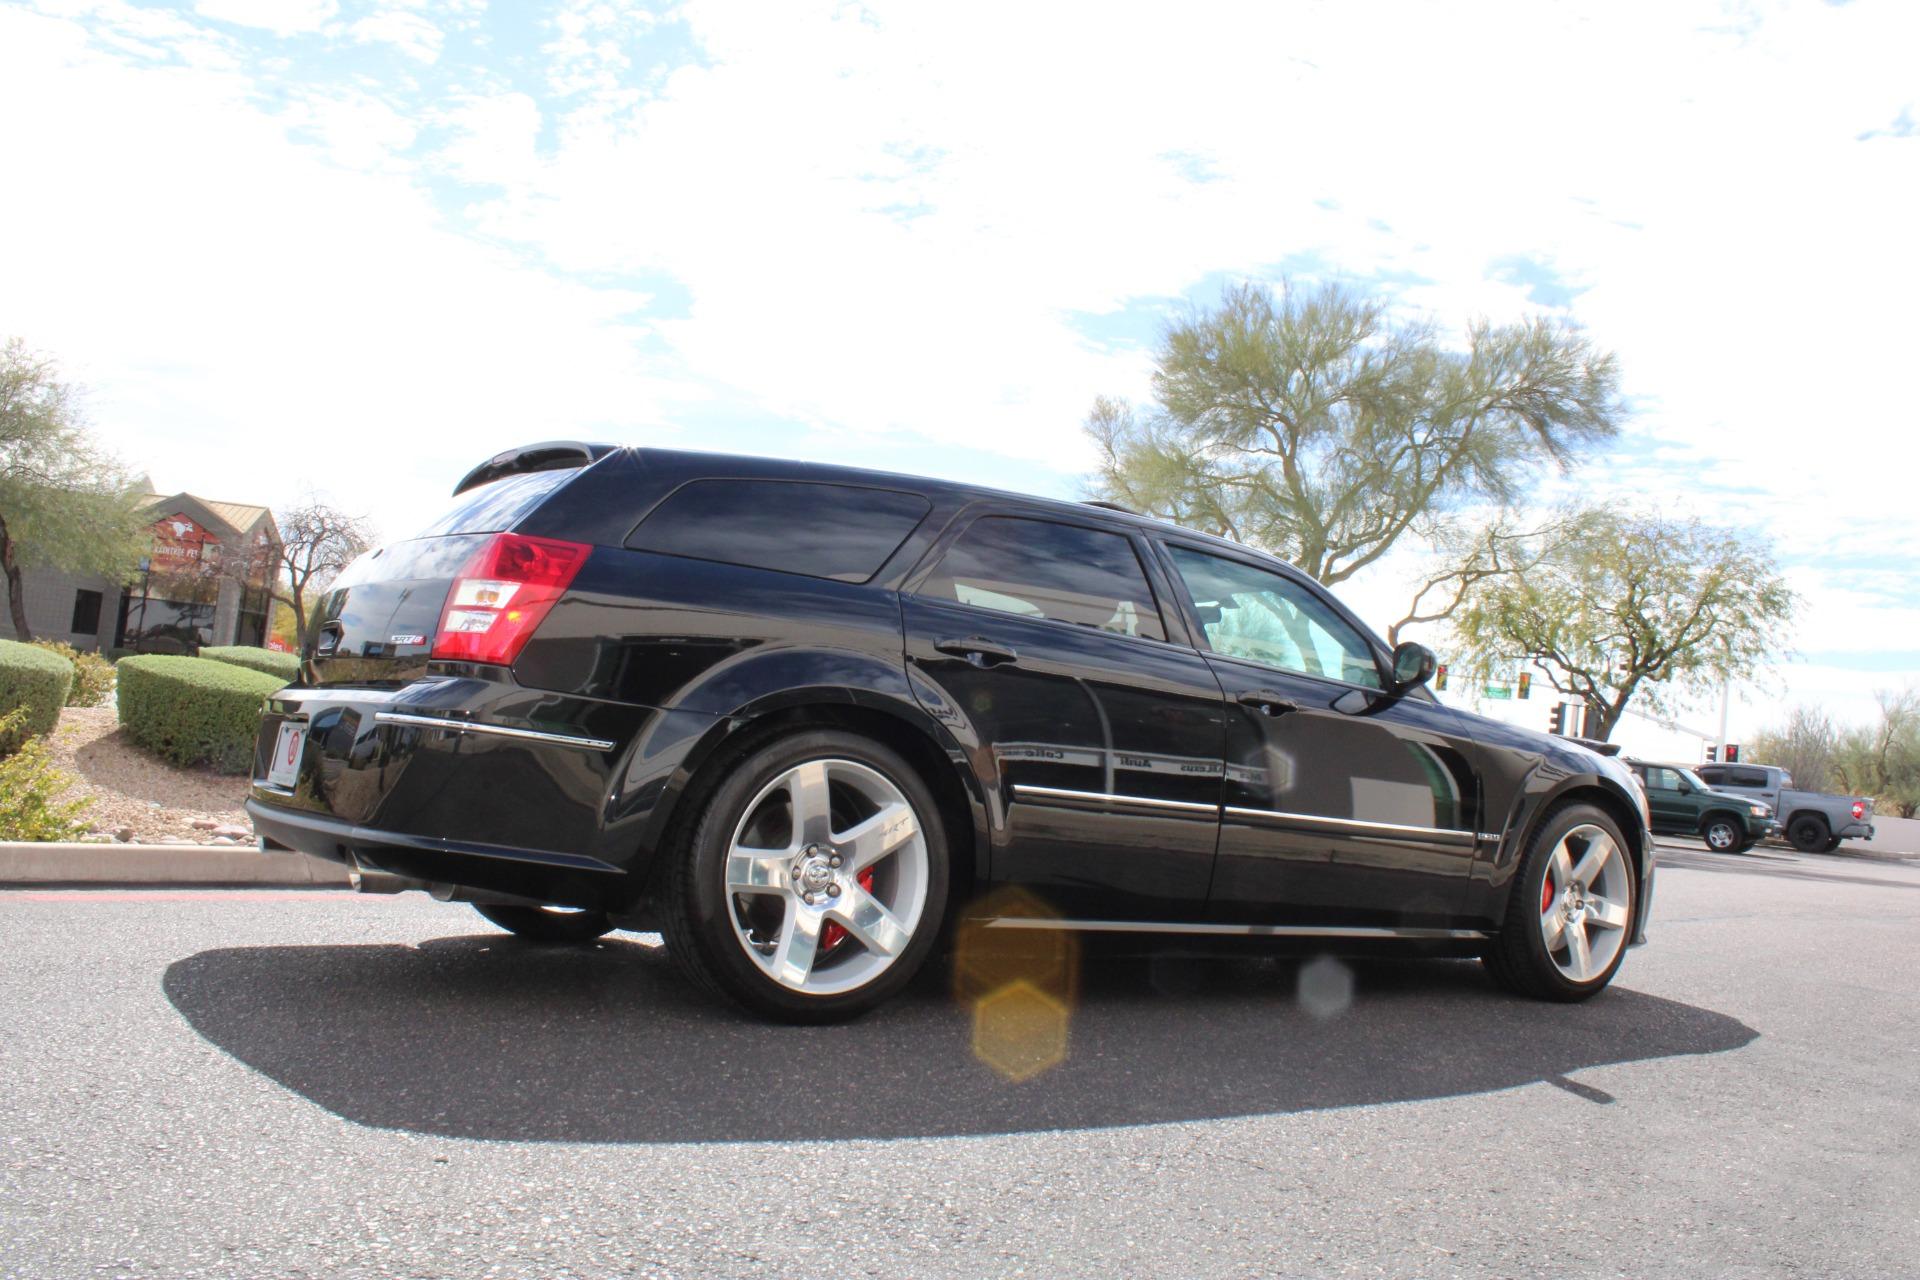 Used-2006-Dodge-Magnum-SRT8-Land-Cruiser